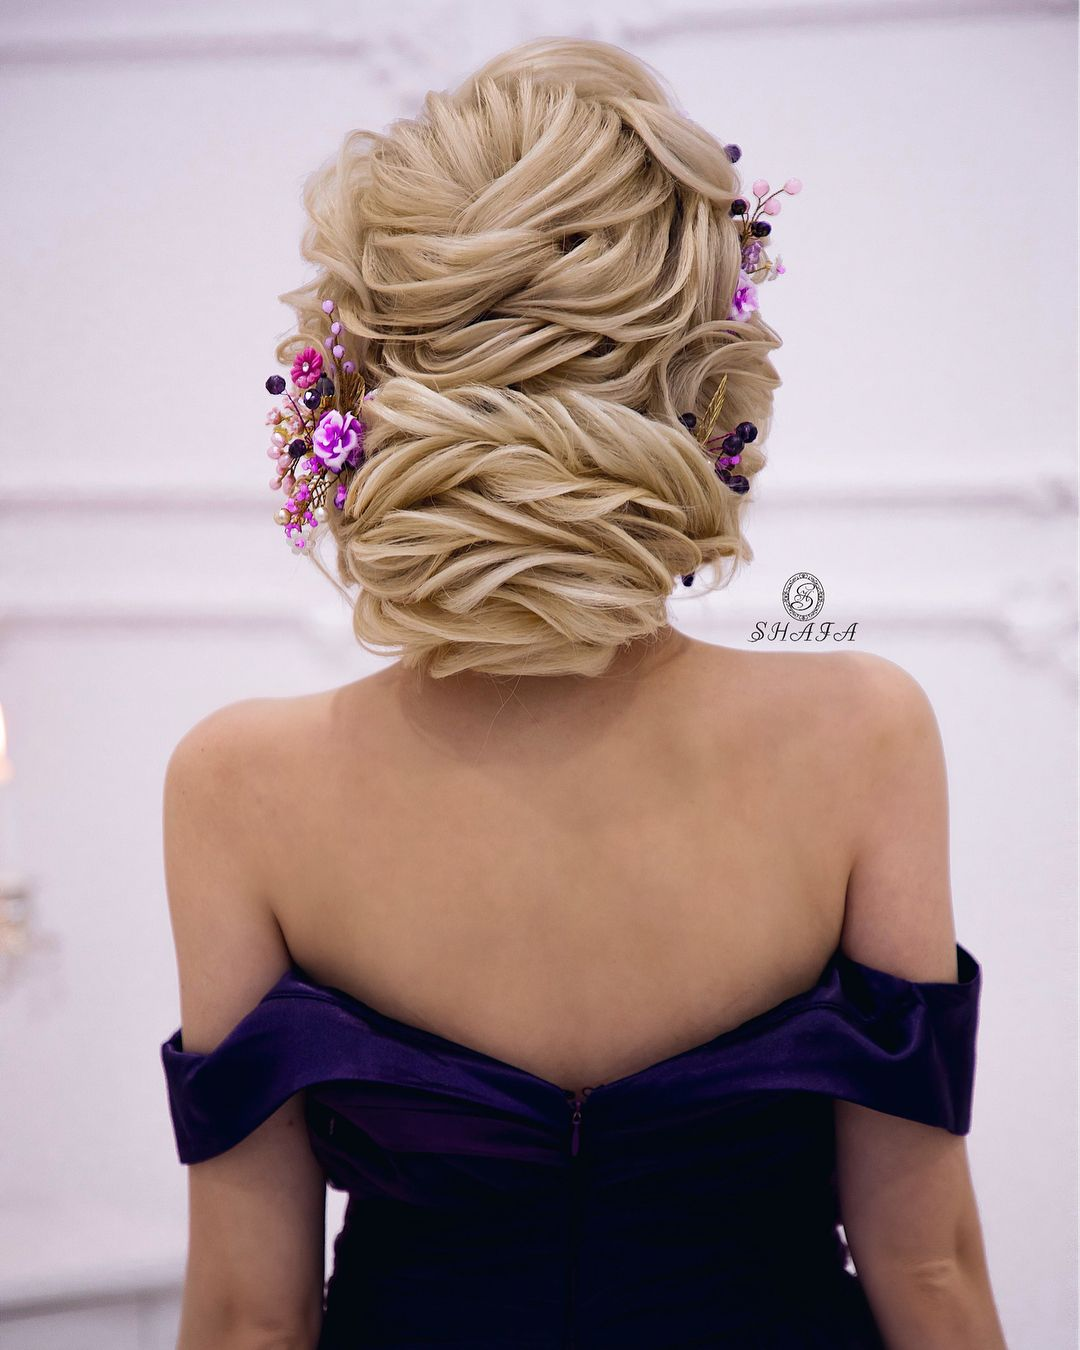 624 Begenme 3 Yorum Instagram Da Shafa Studio Shafastudio Long Hair Updo Long Hair Designs Wedding Hairstyles For Long Hair